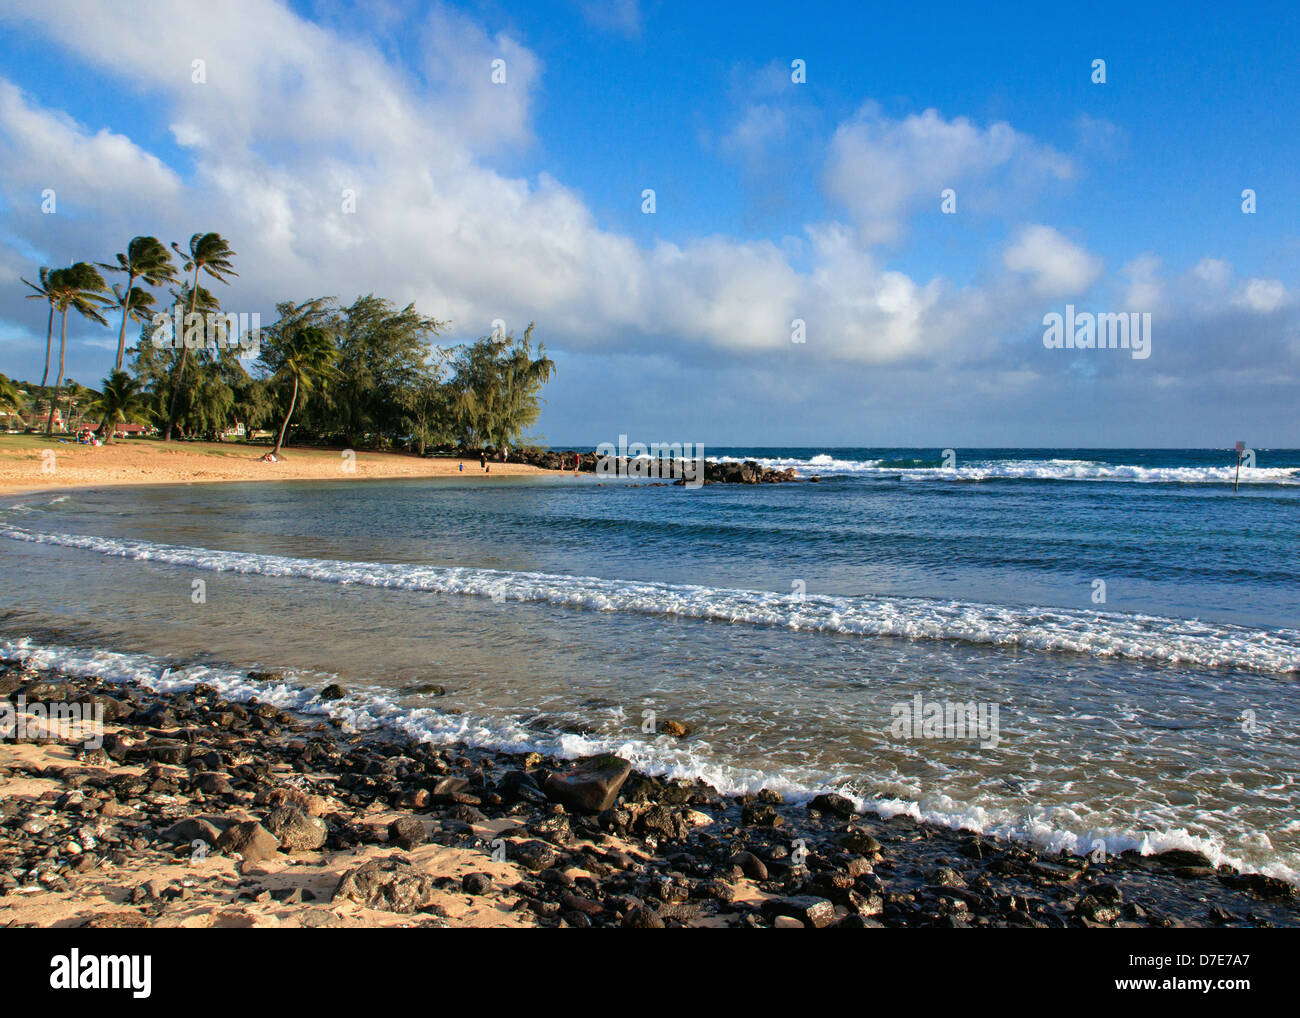 Poipu Beach Park, en la isla de Kauai, Hawaii. Foto de stock